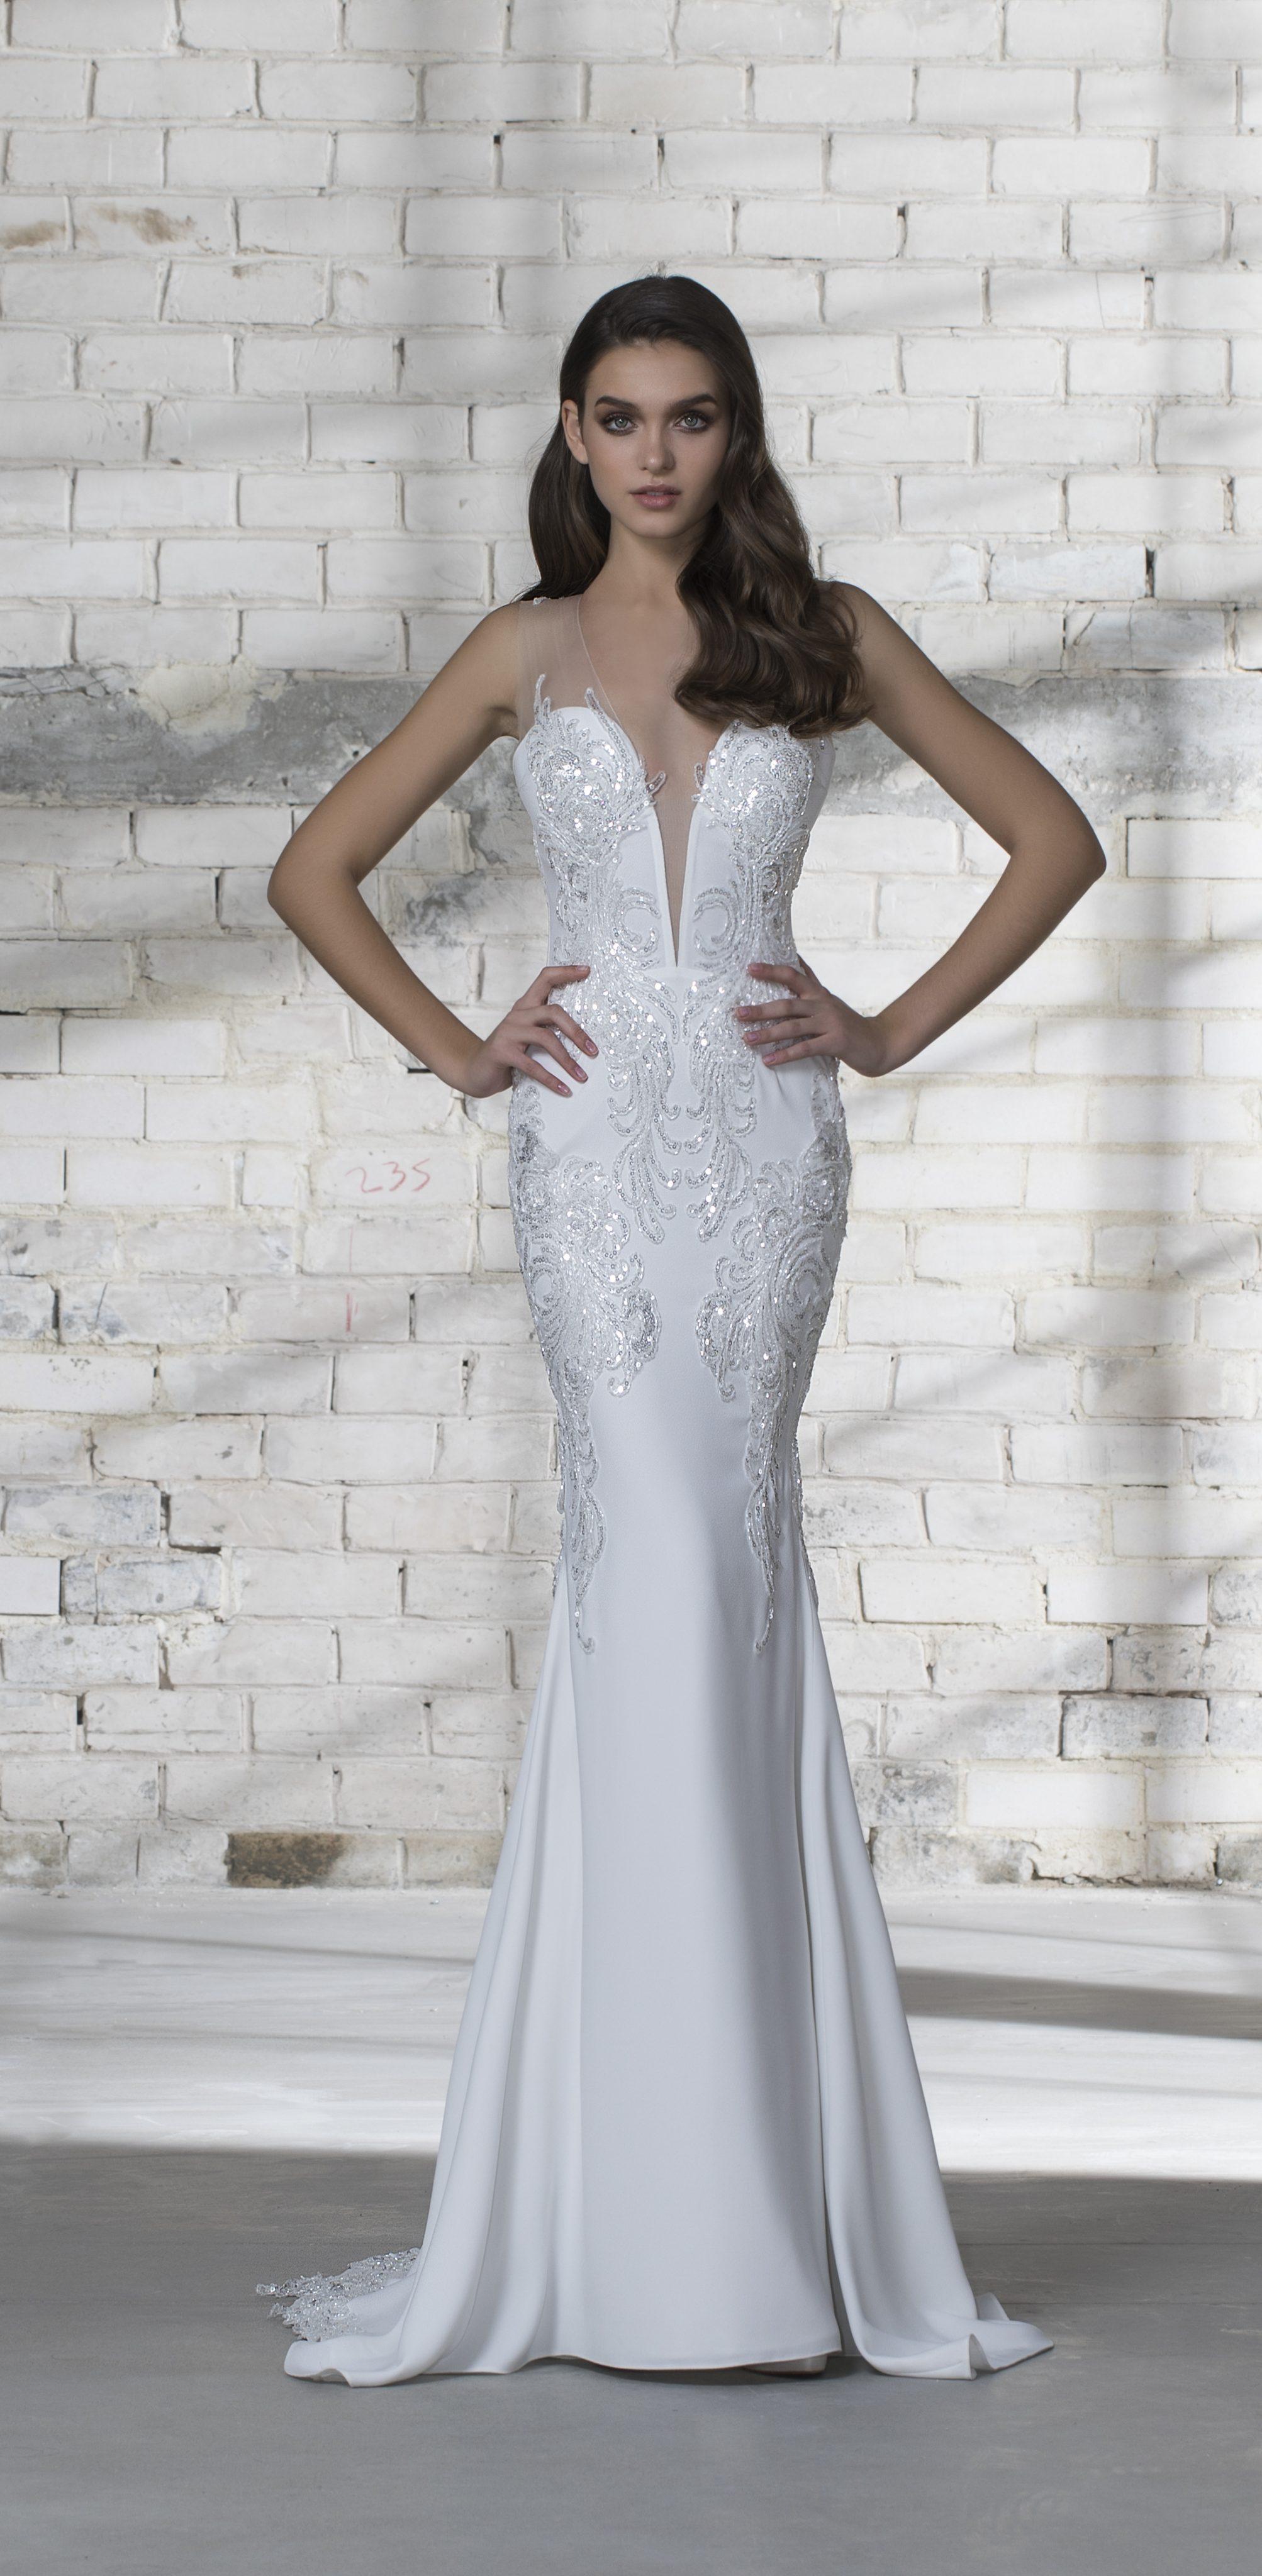 bfa6bc549 Plunging Neckline Sequin Detailed Sheath Wedding Dress